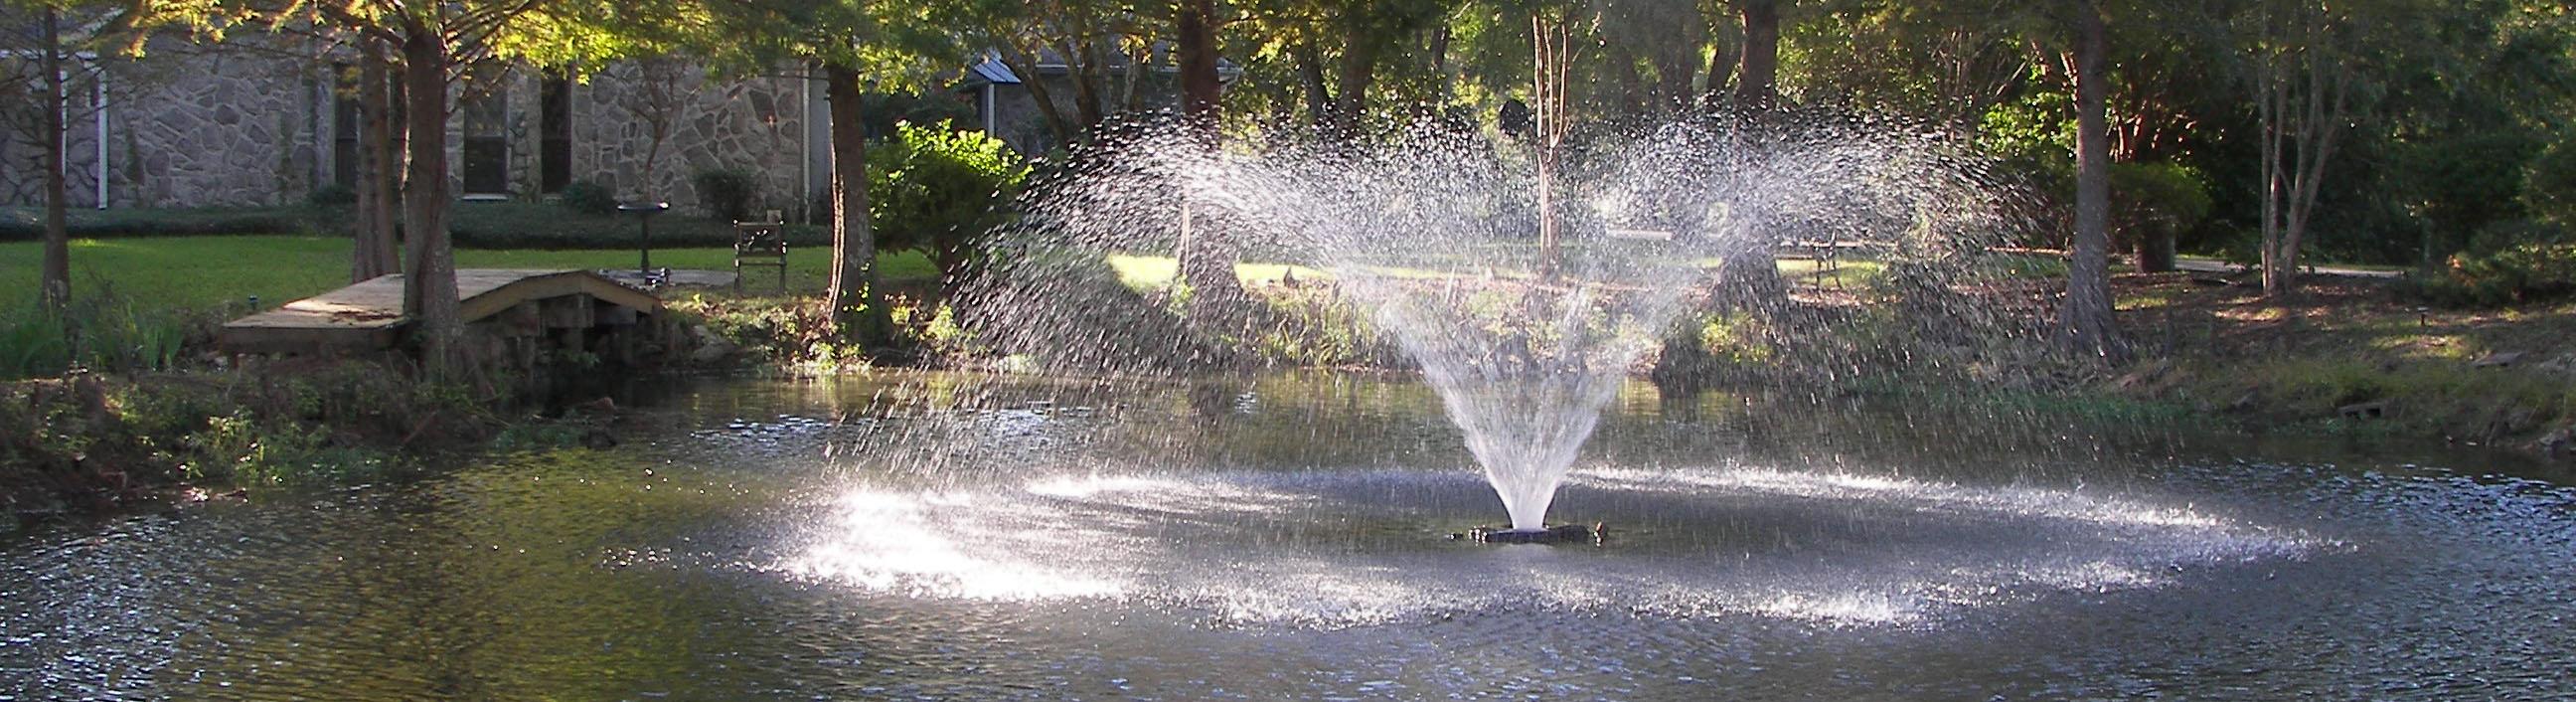 residential pond aeration